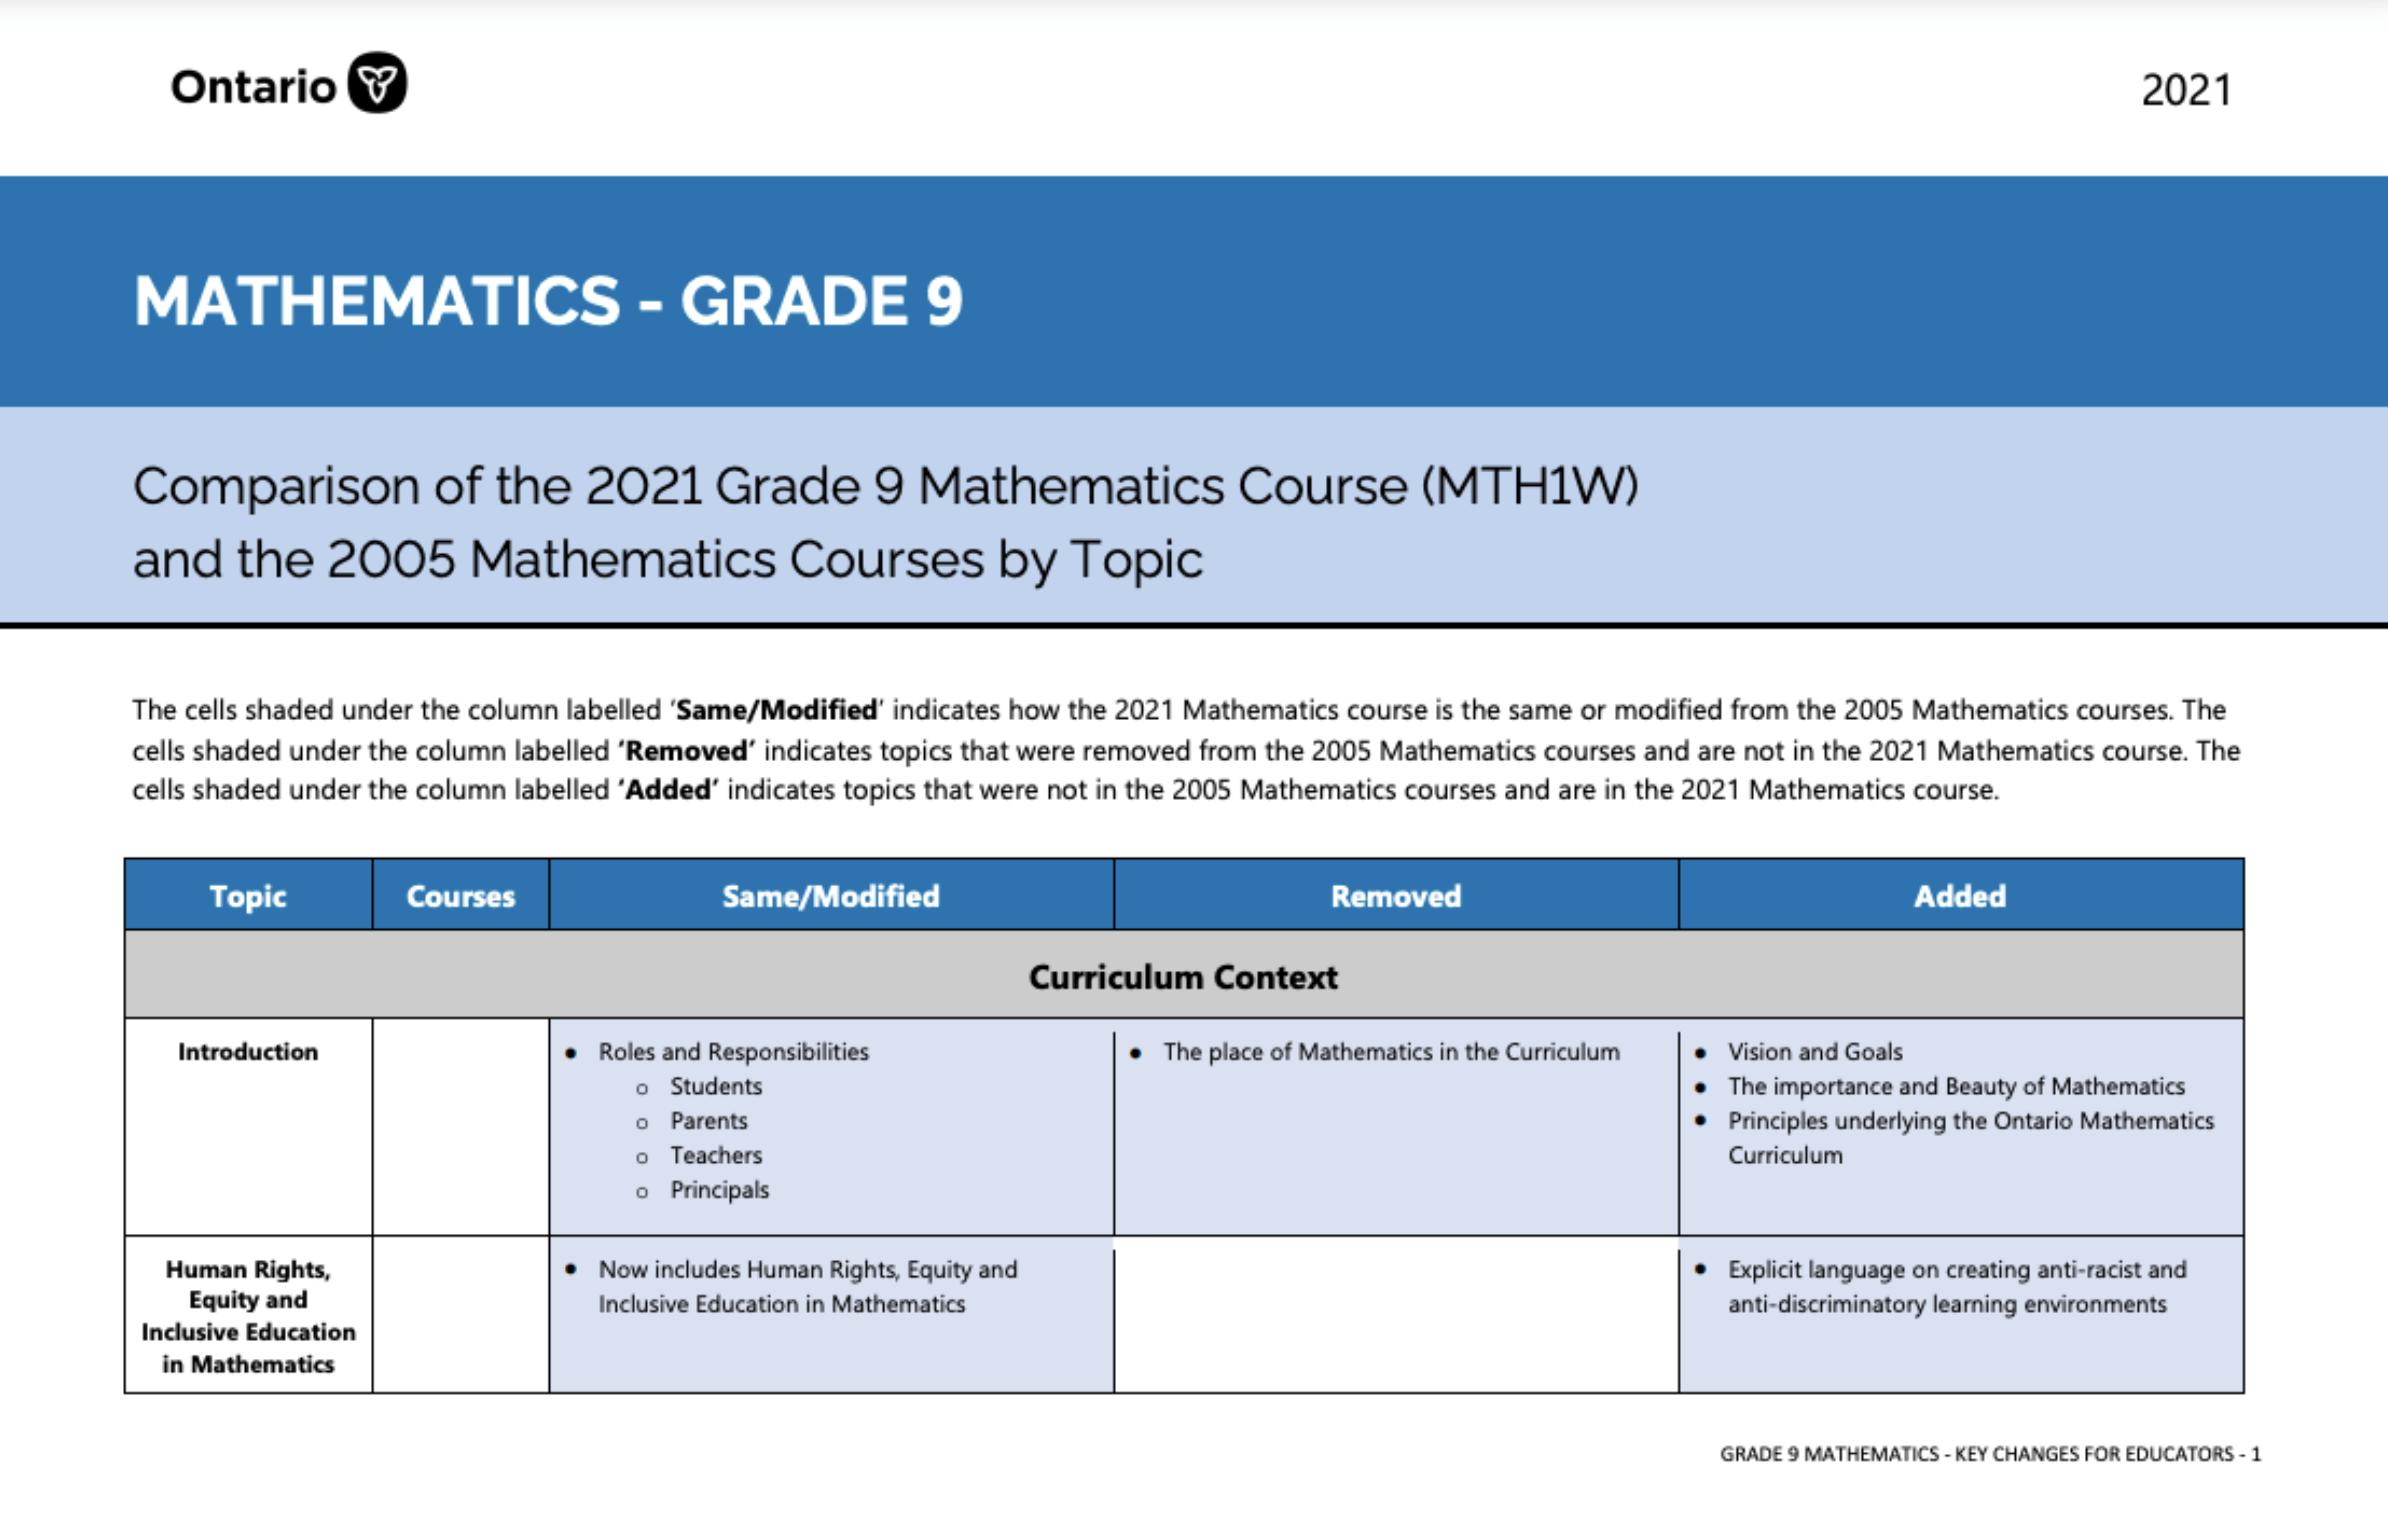 MTH1W De-streamed Mathematics, 9 Curriculum Key Changes PDF